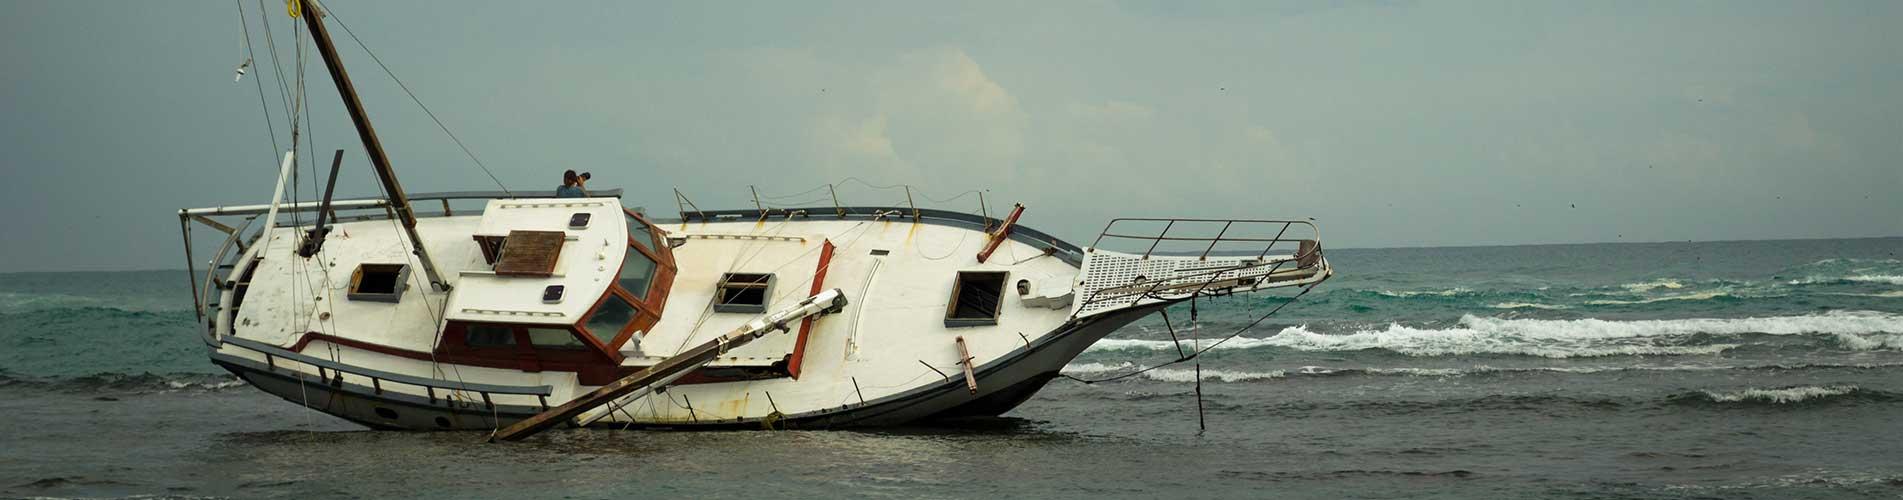 ship stranded on shore